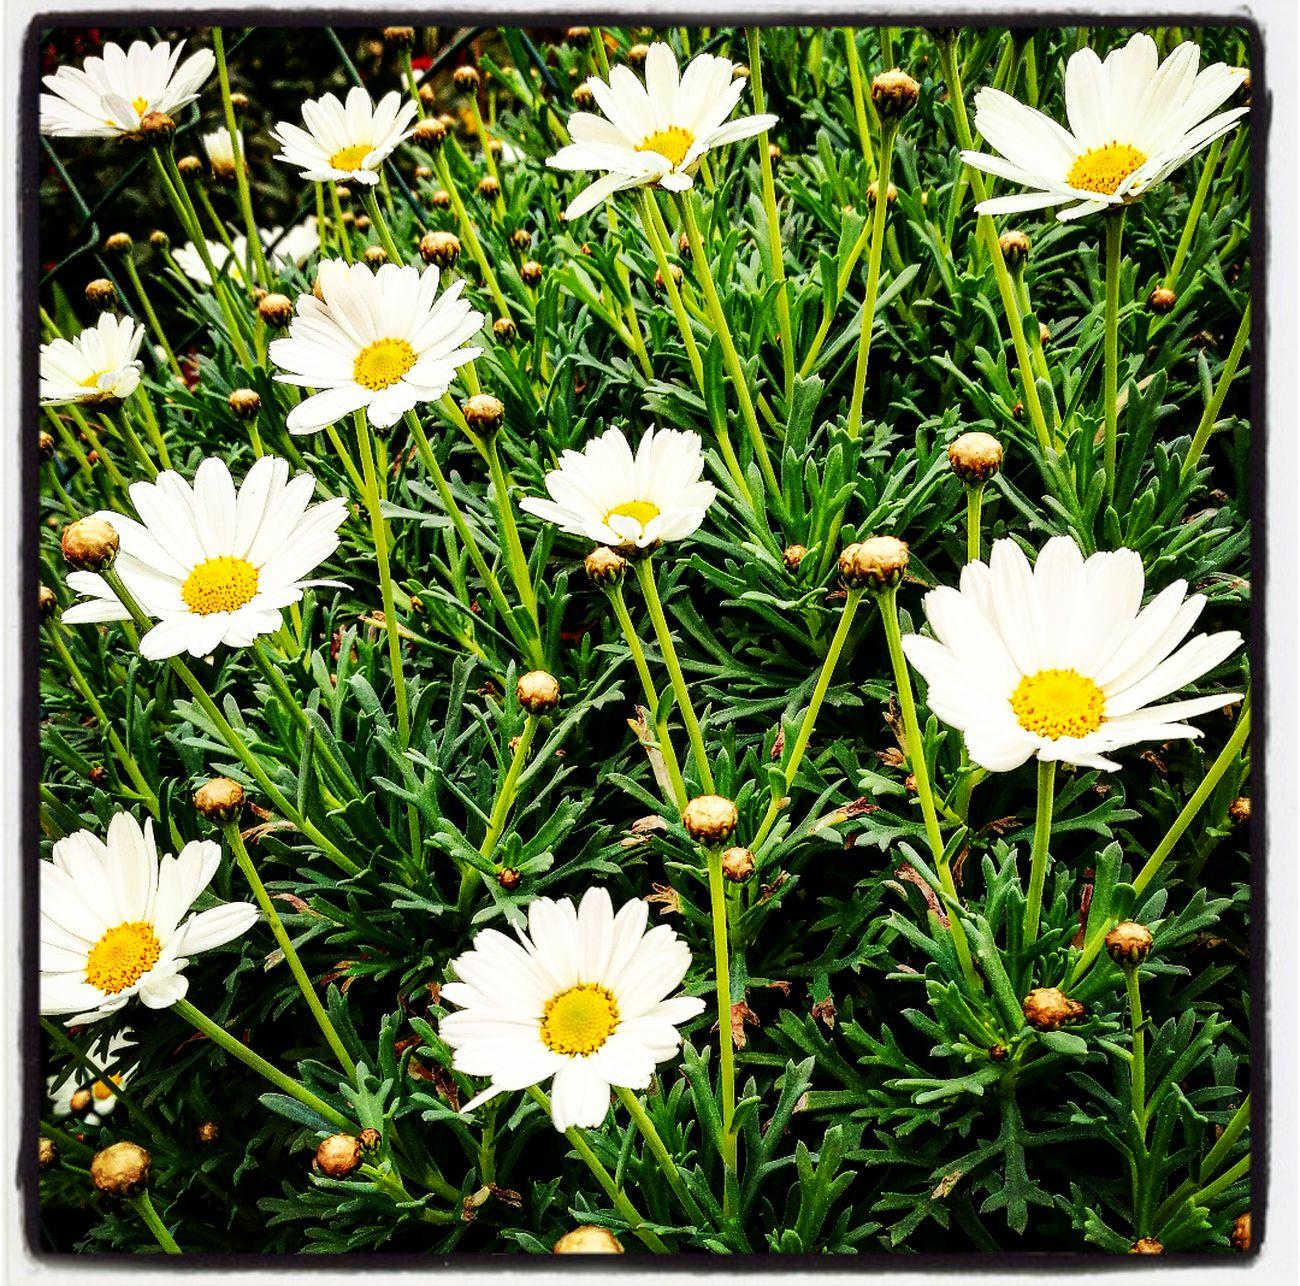 VillaGuardia Imperia Liguria Italy Springtime happy flowers sun🌸☀